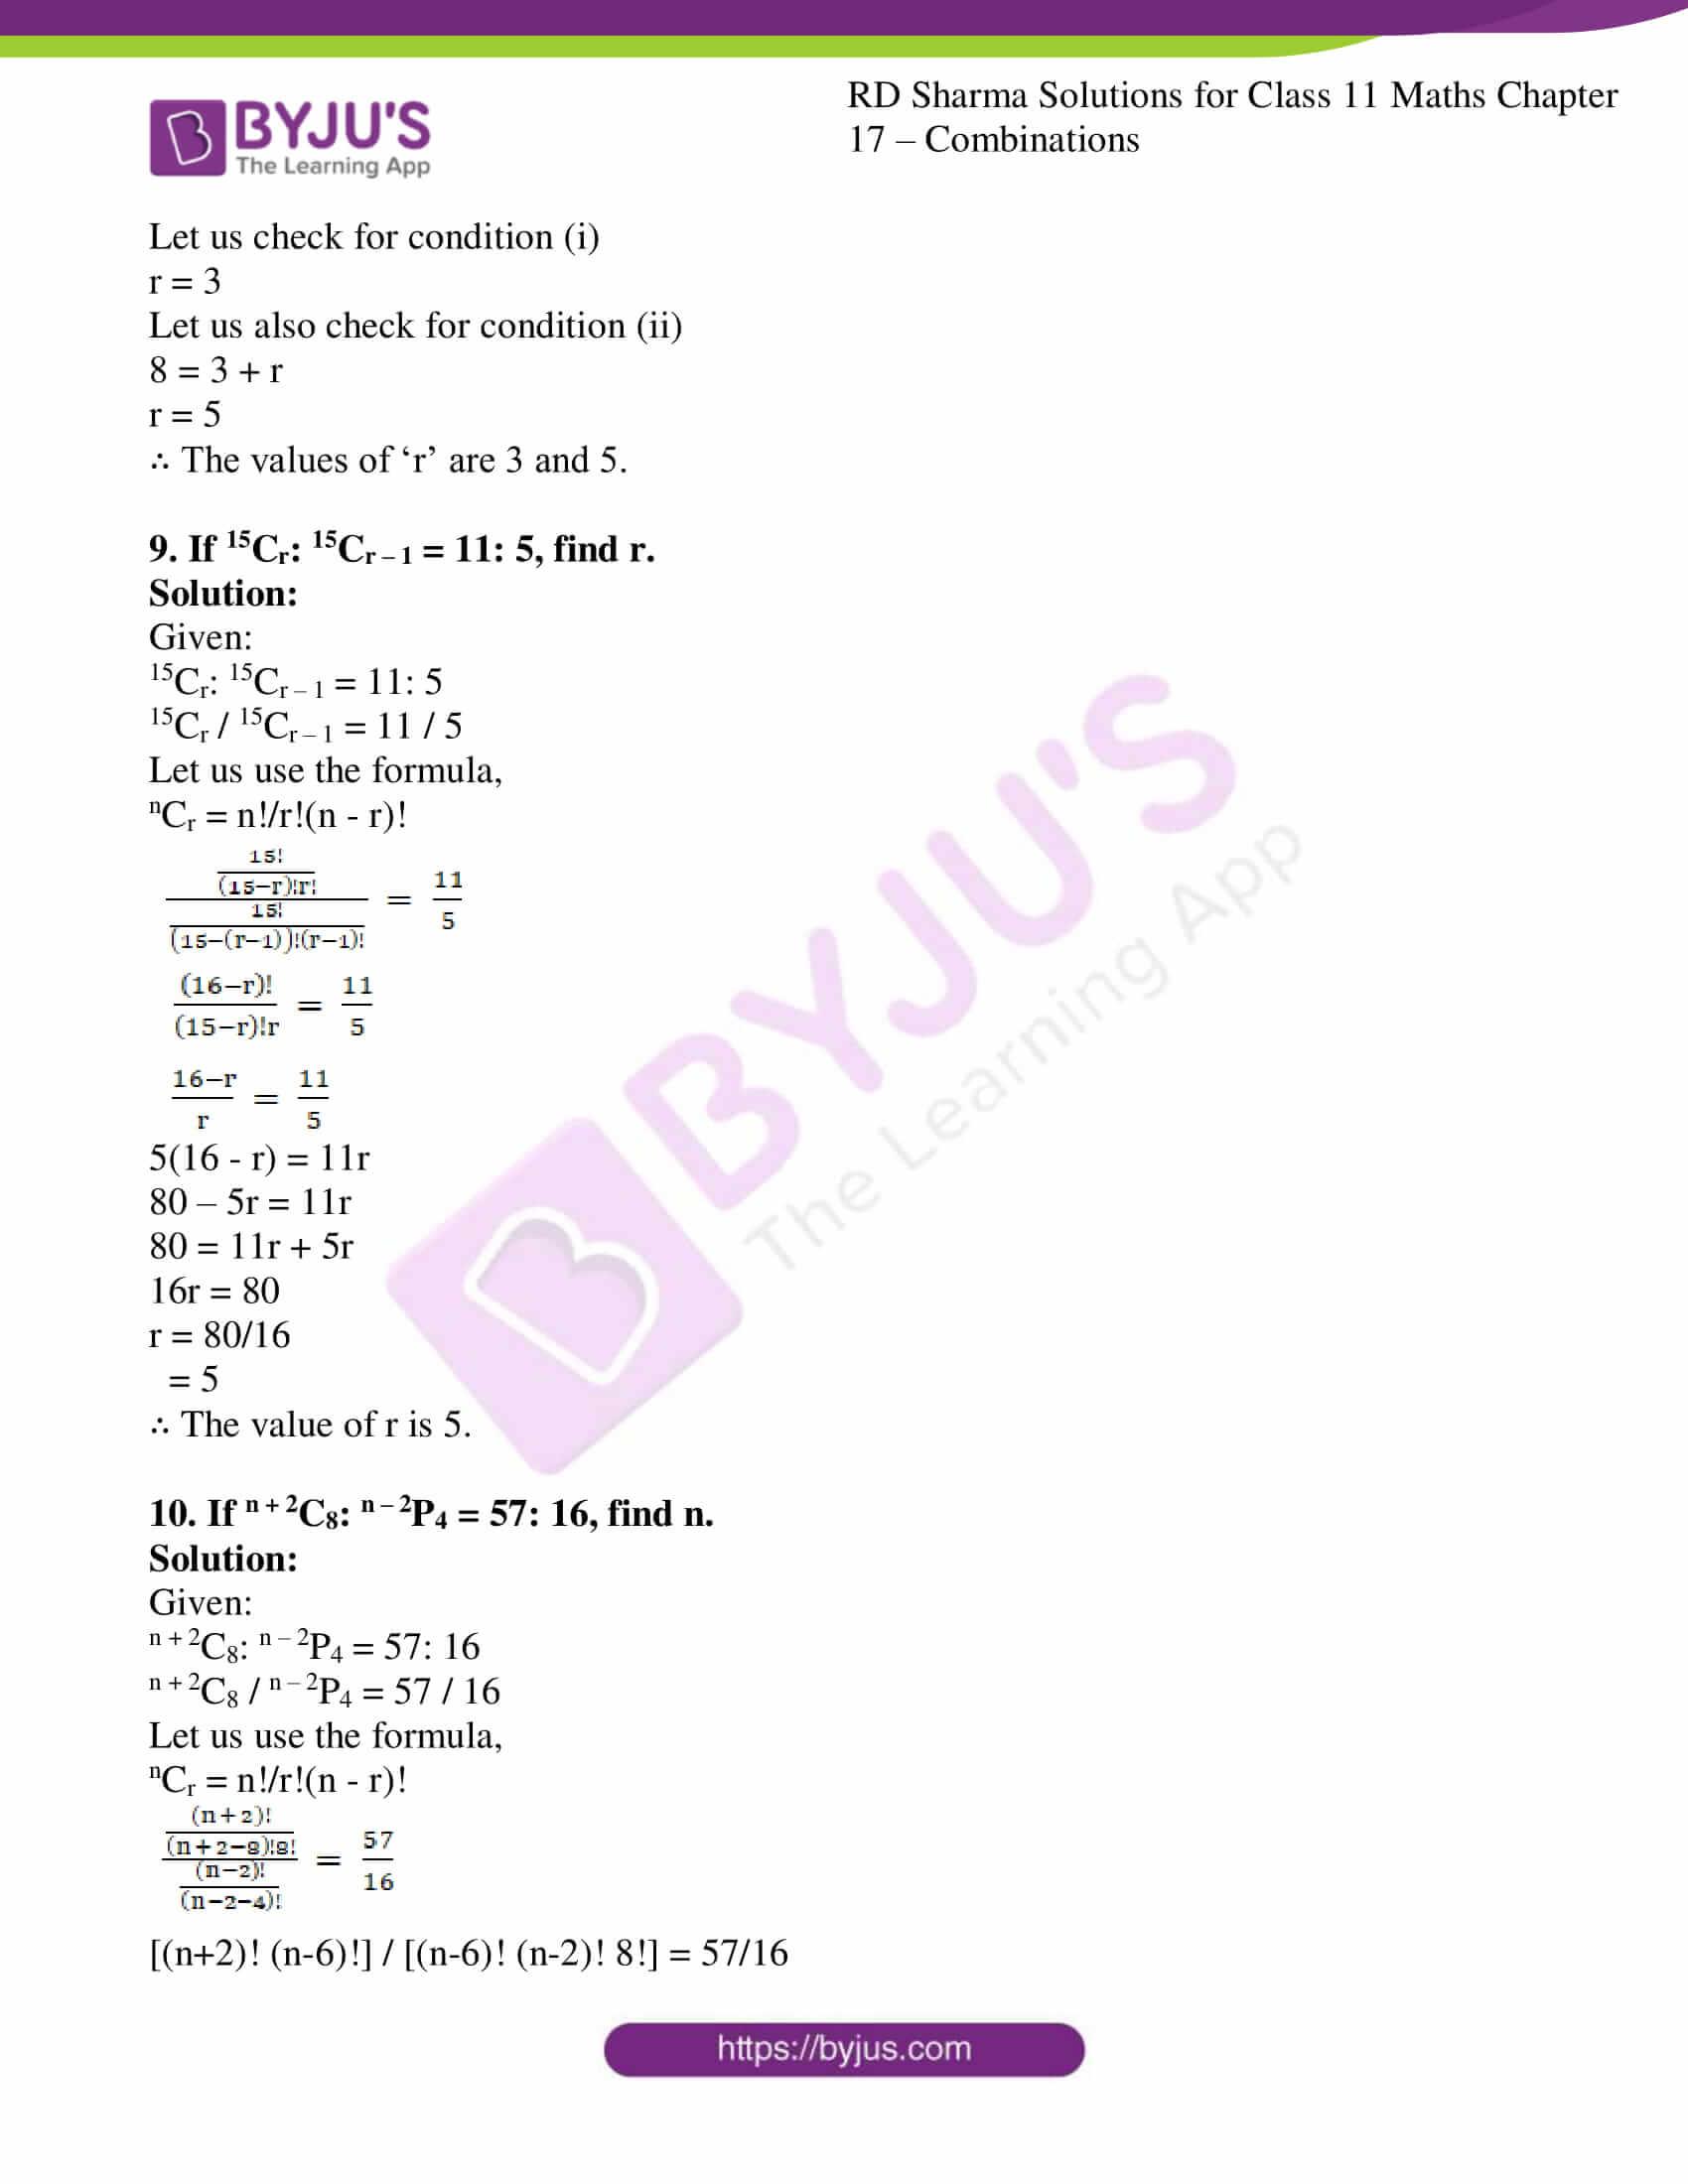 rd sharma class 11 maths ch 17 ex 1 6